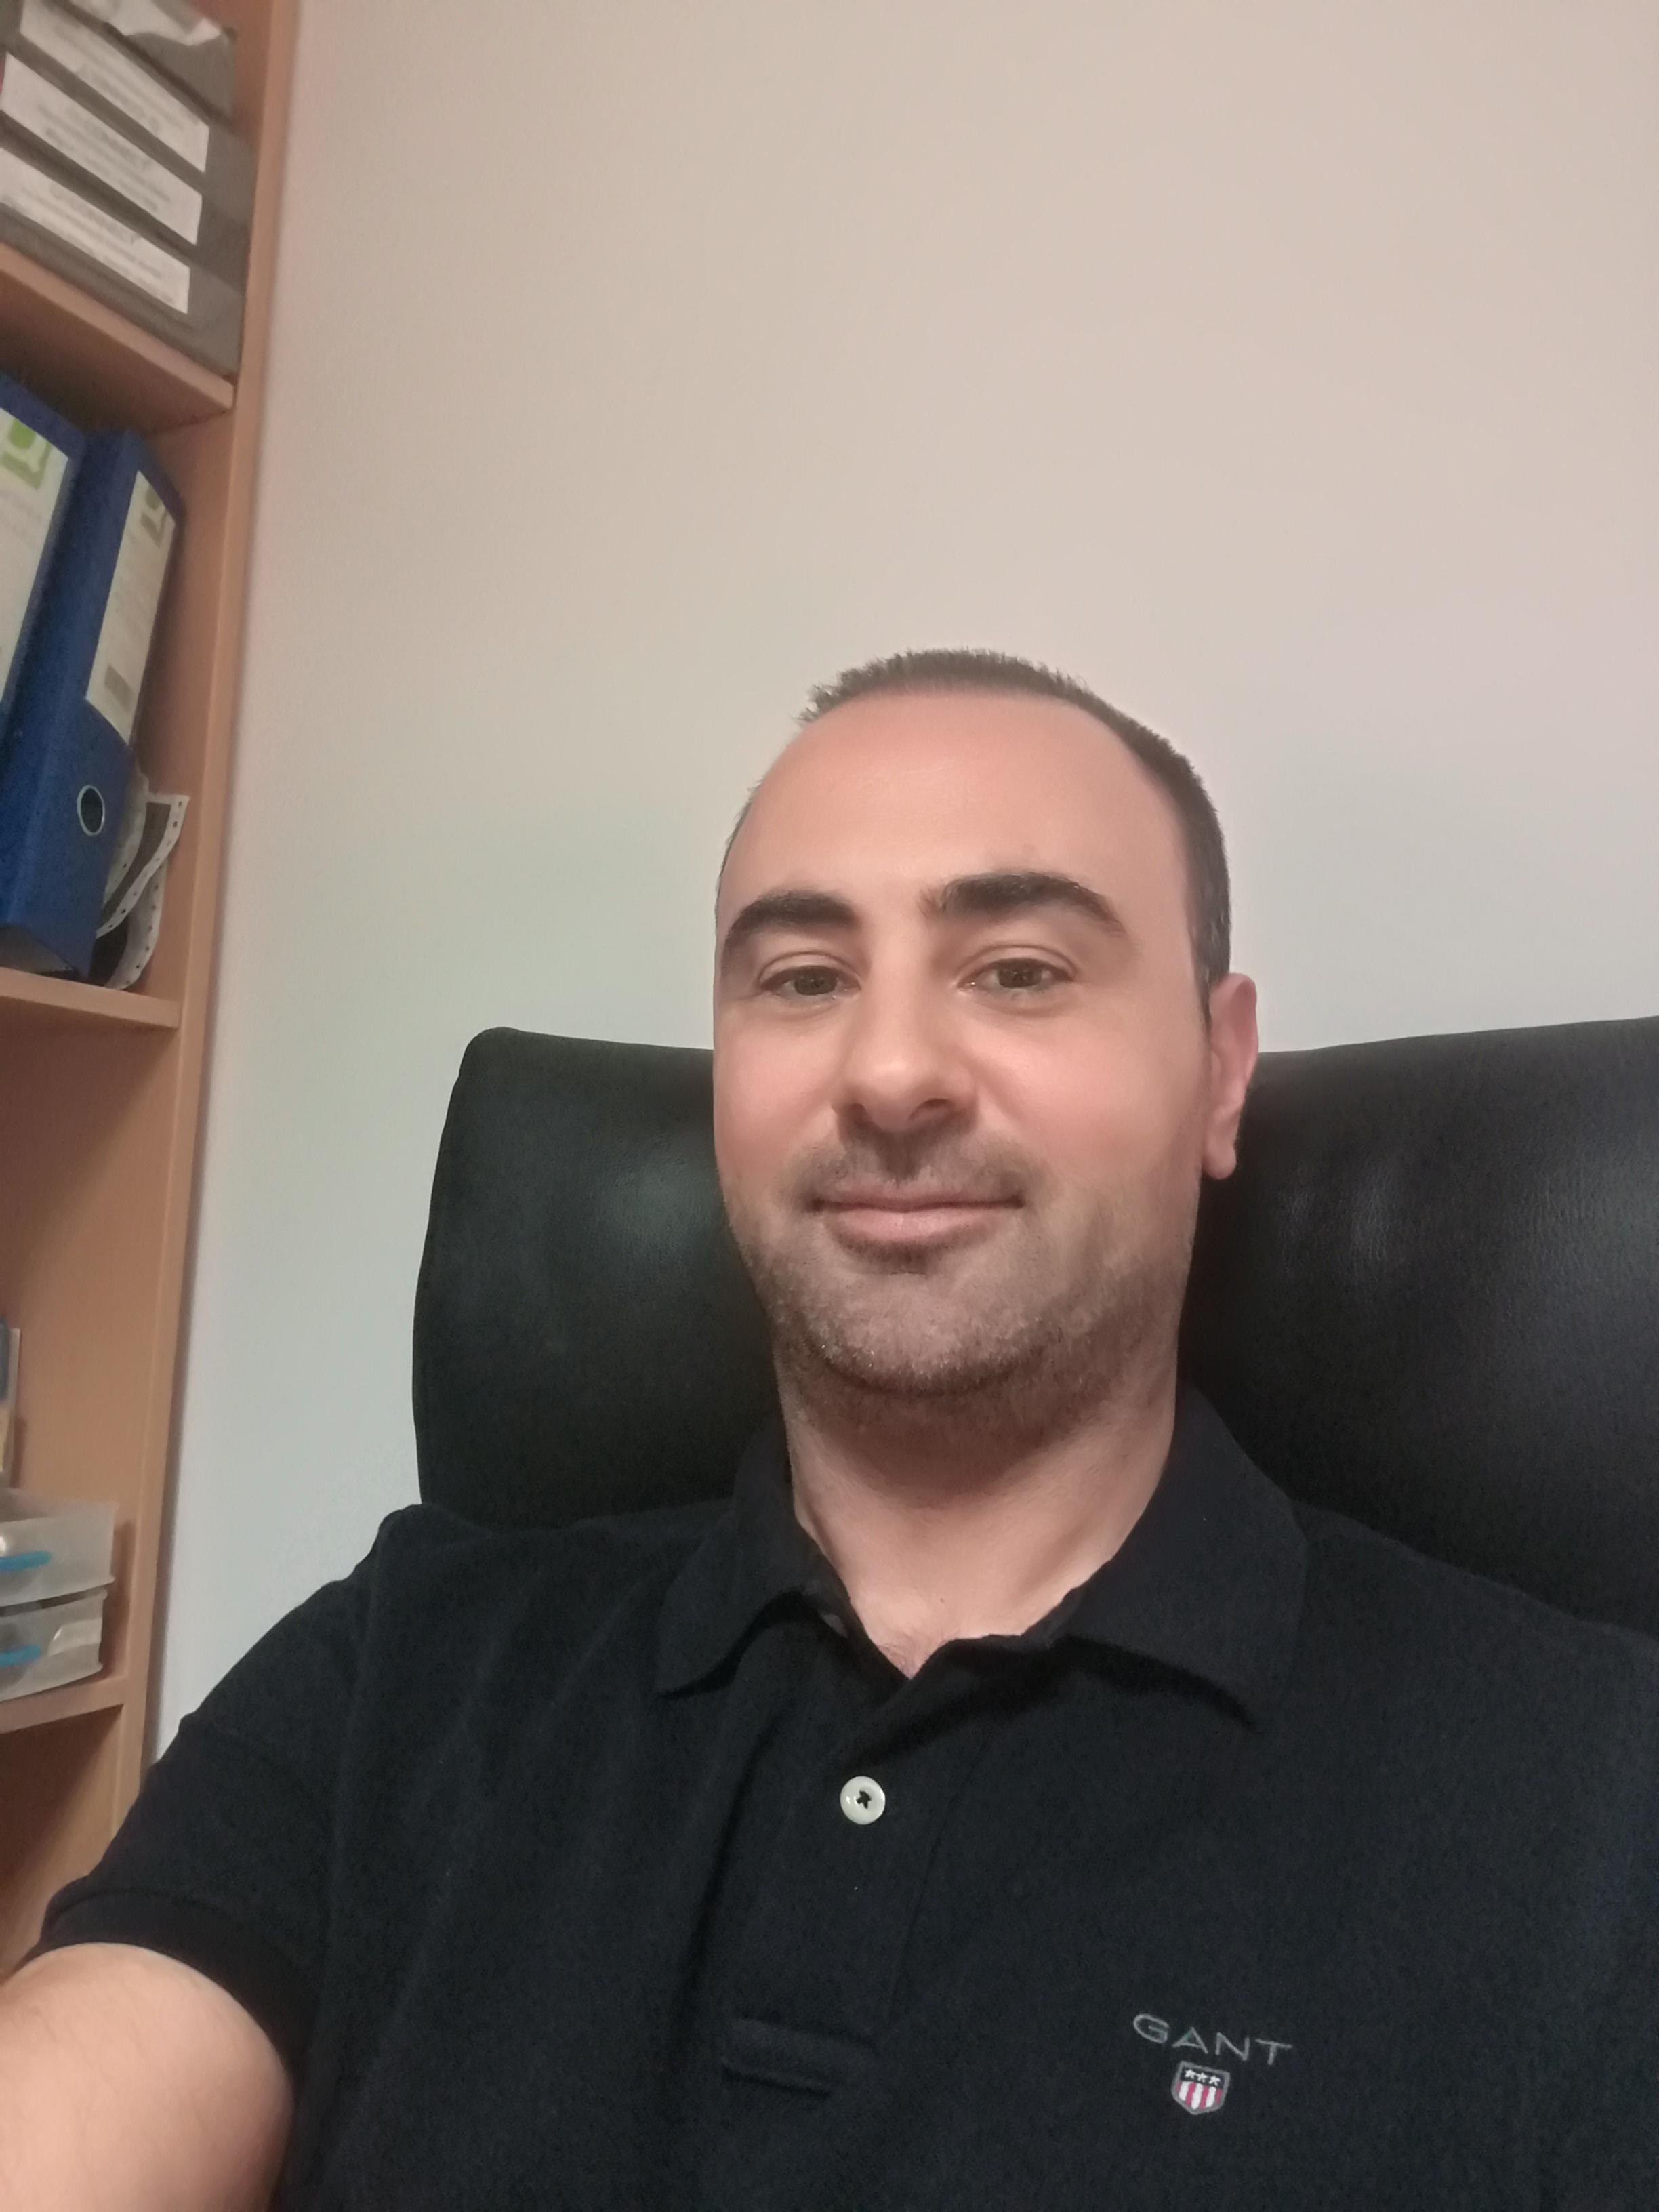 Georgiopoulos